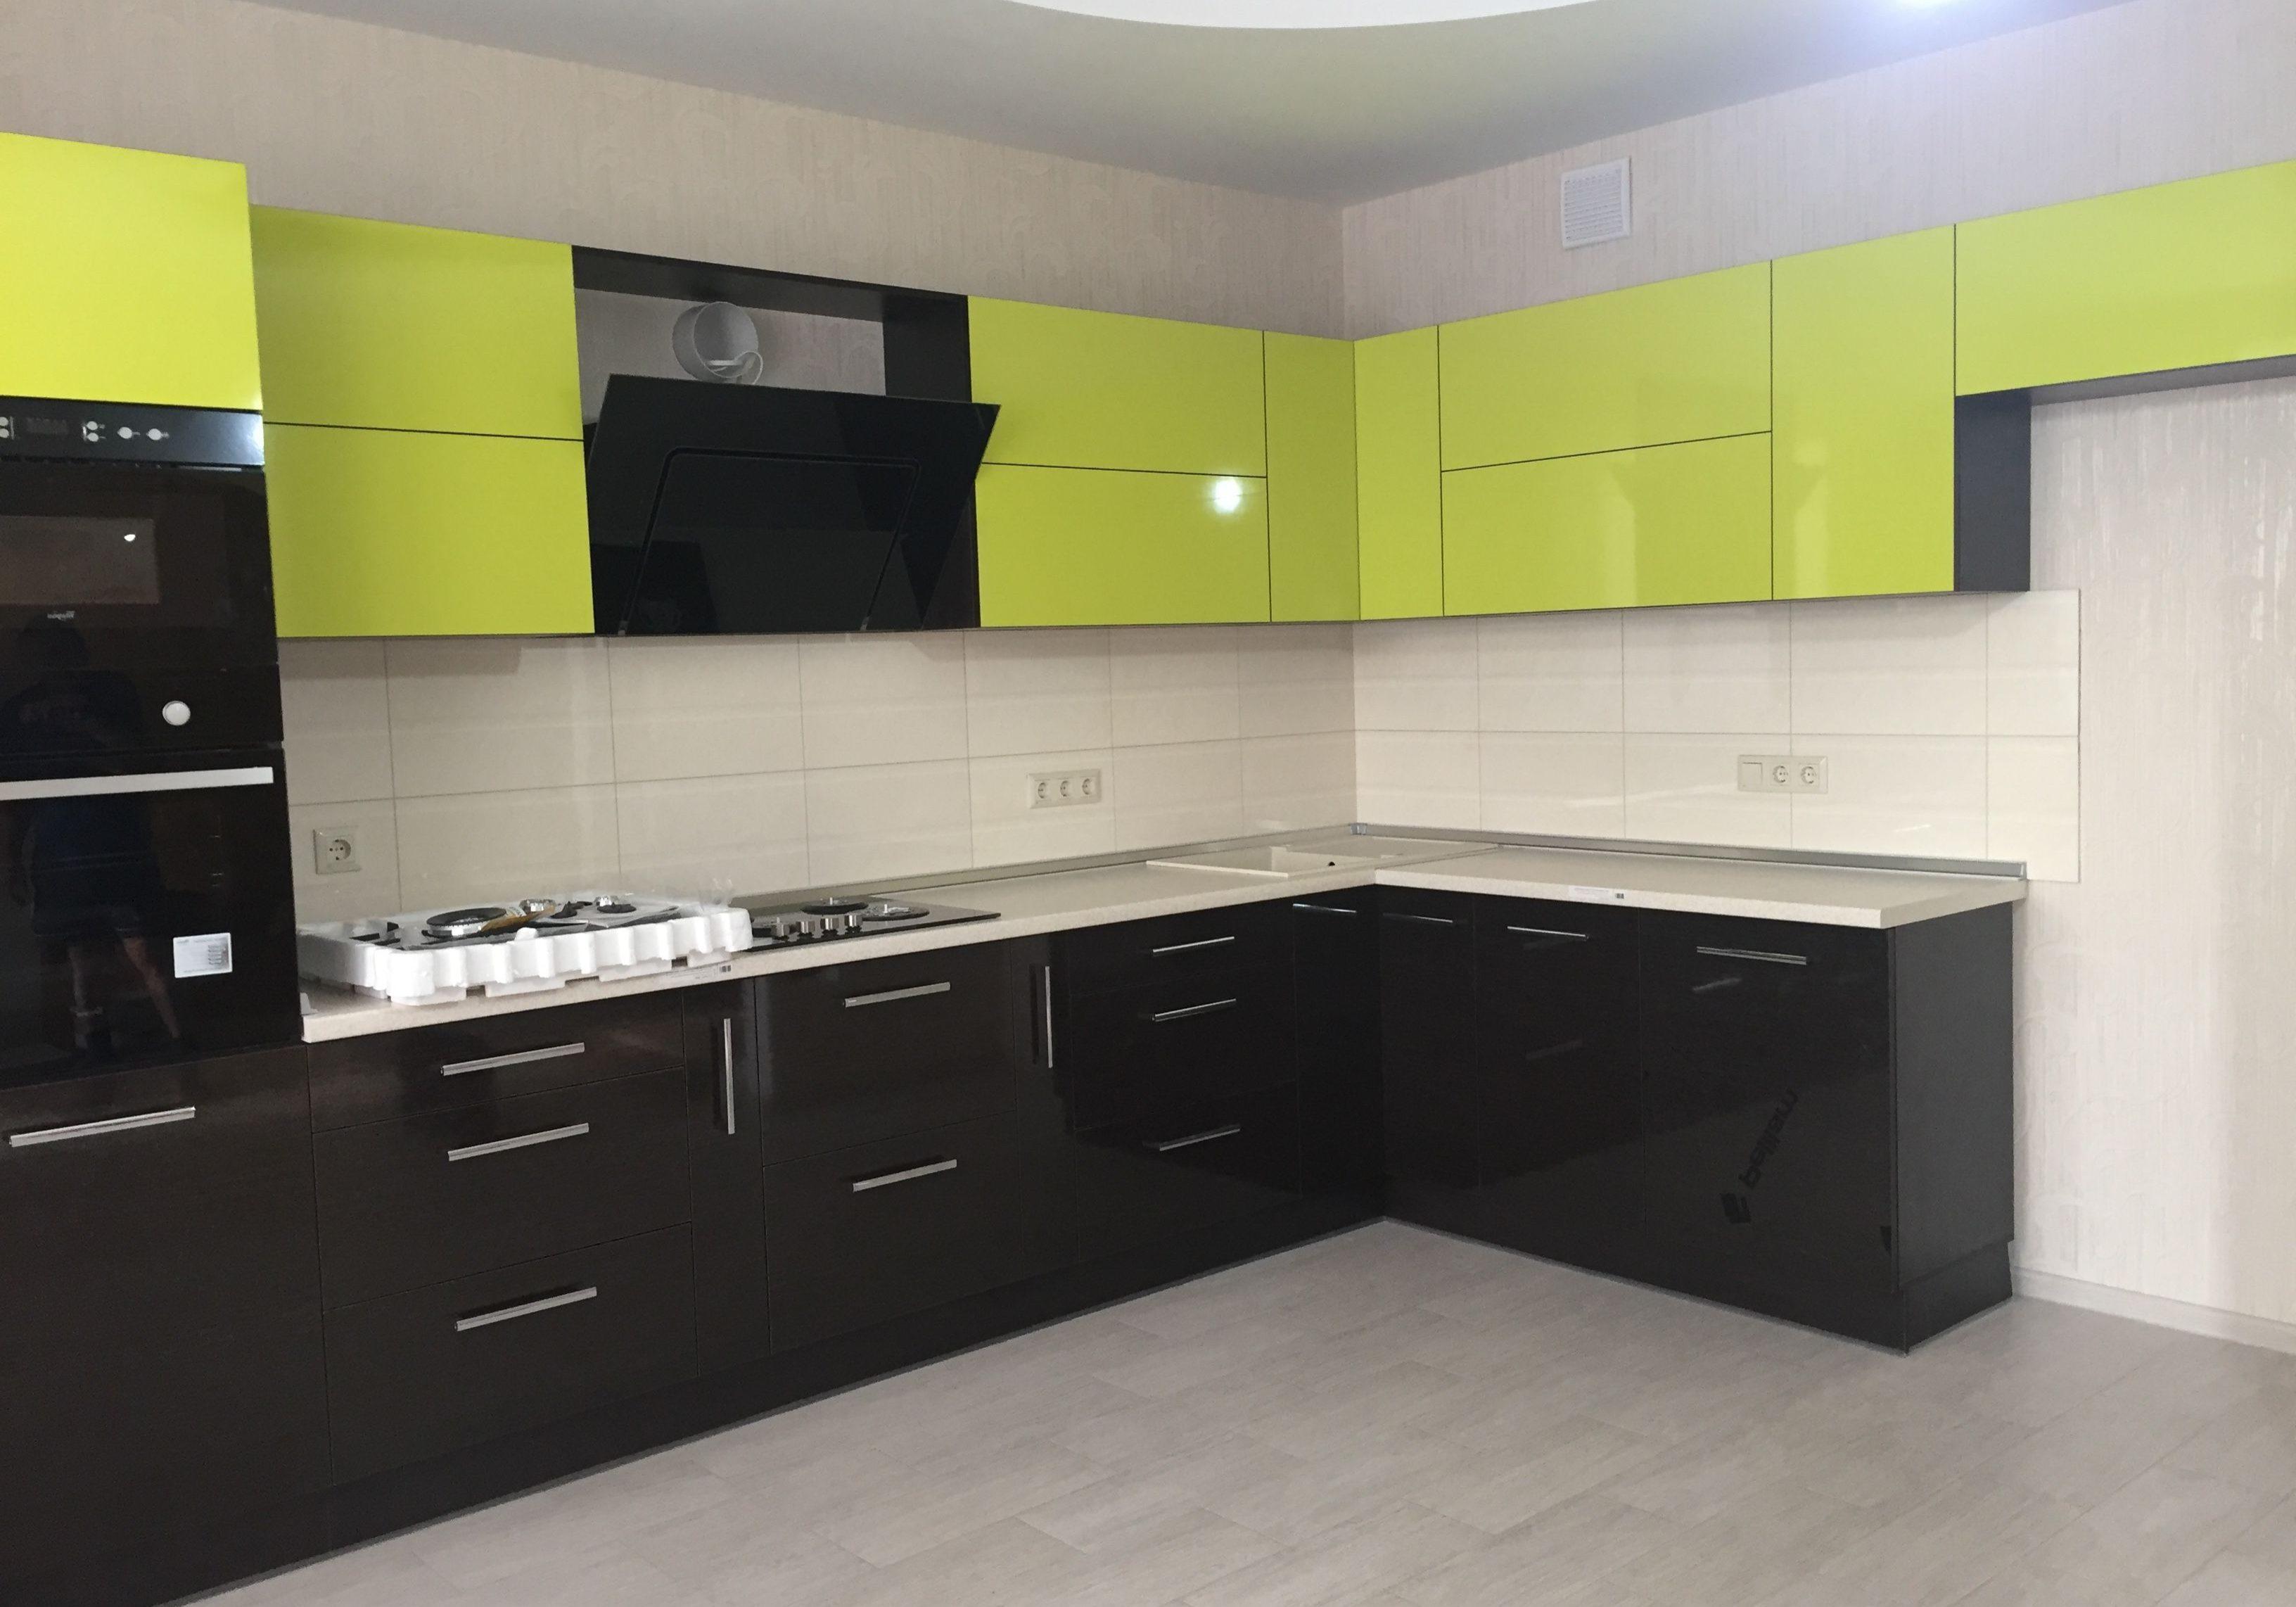 Кухня лайм и коричневые фасадсы